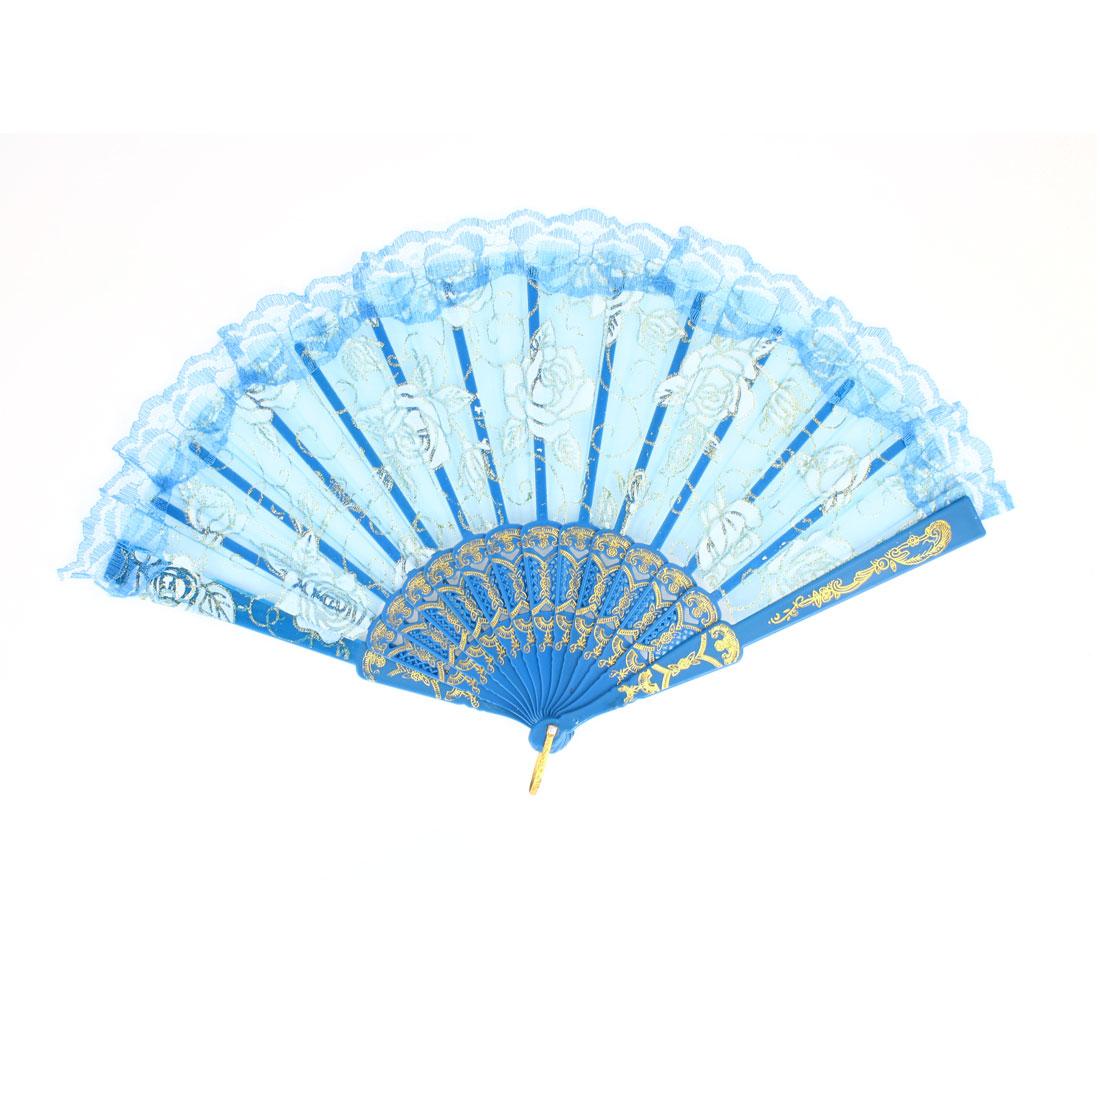 White Flower Pattern Lace Brim Organza Hand Fan Gold Tone Blue w D Ring